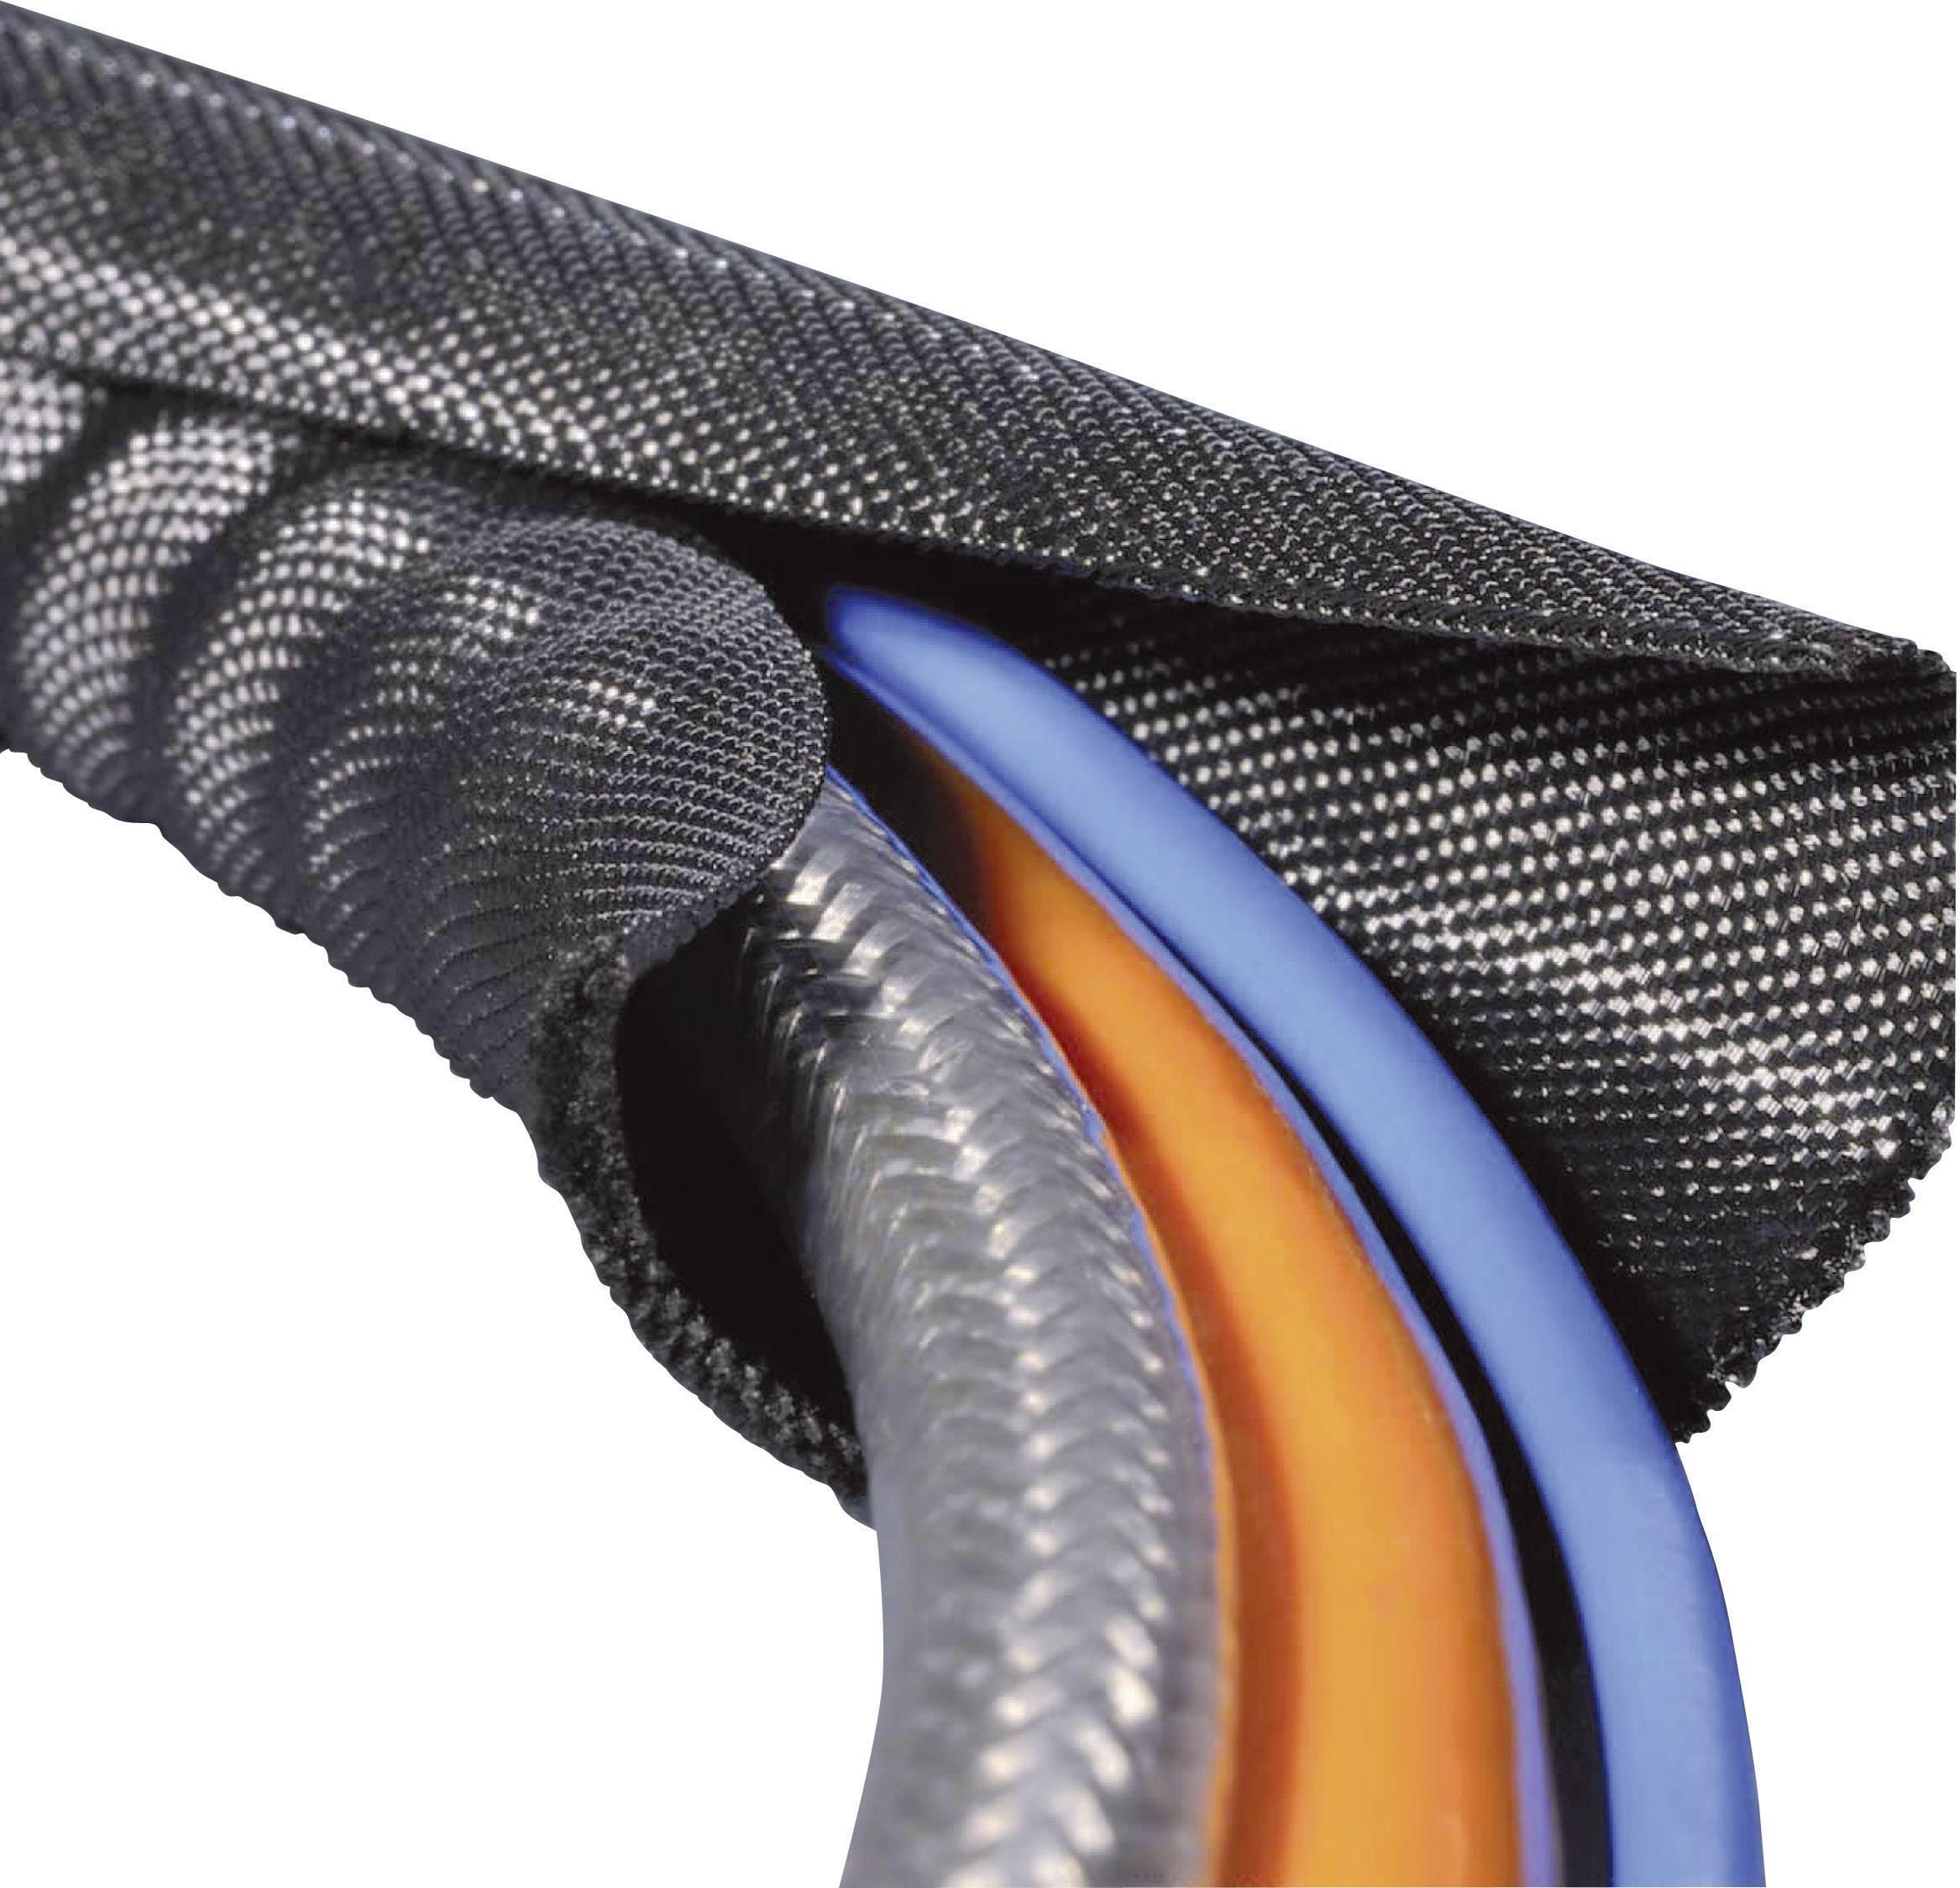 Ochranný oplet HellermannTyton Twist-In 13, 10 do 13 mm, -70 do +125 °C, metrový tovar, čierna